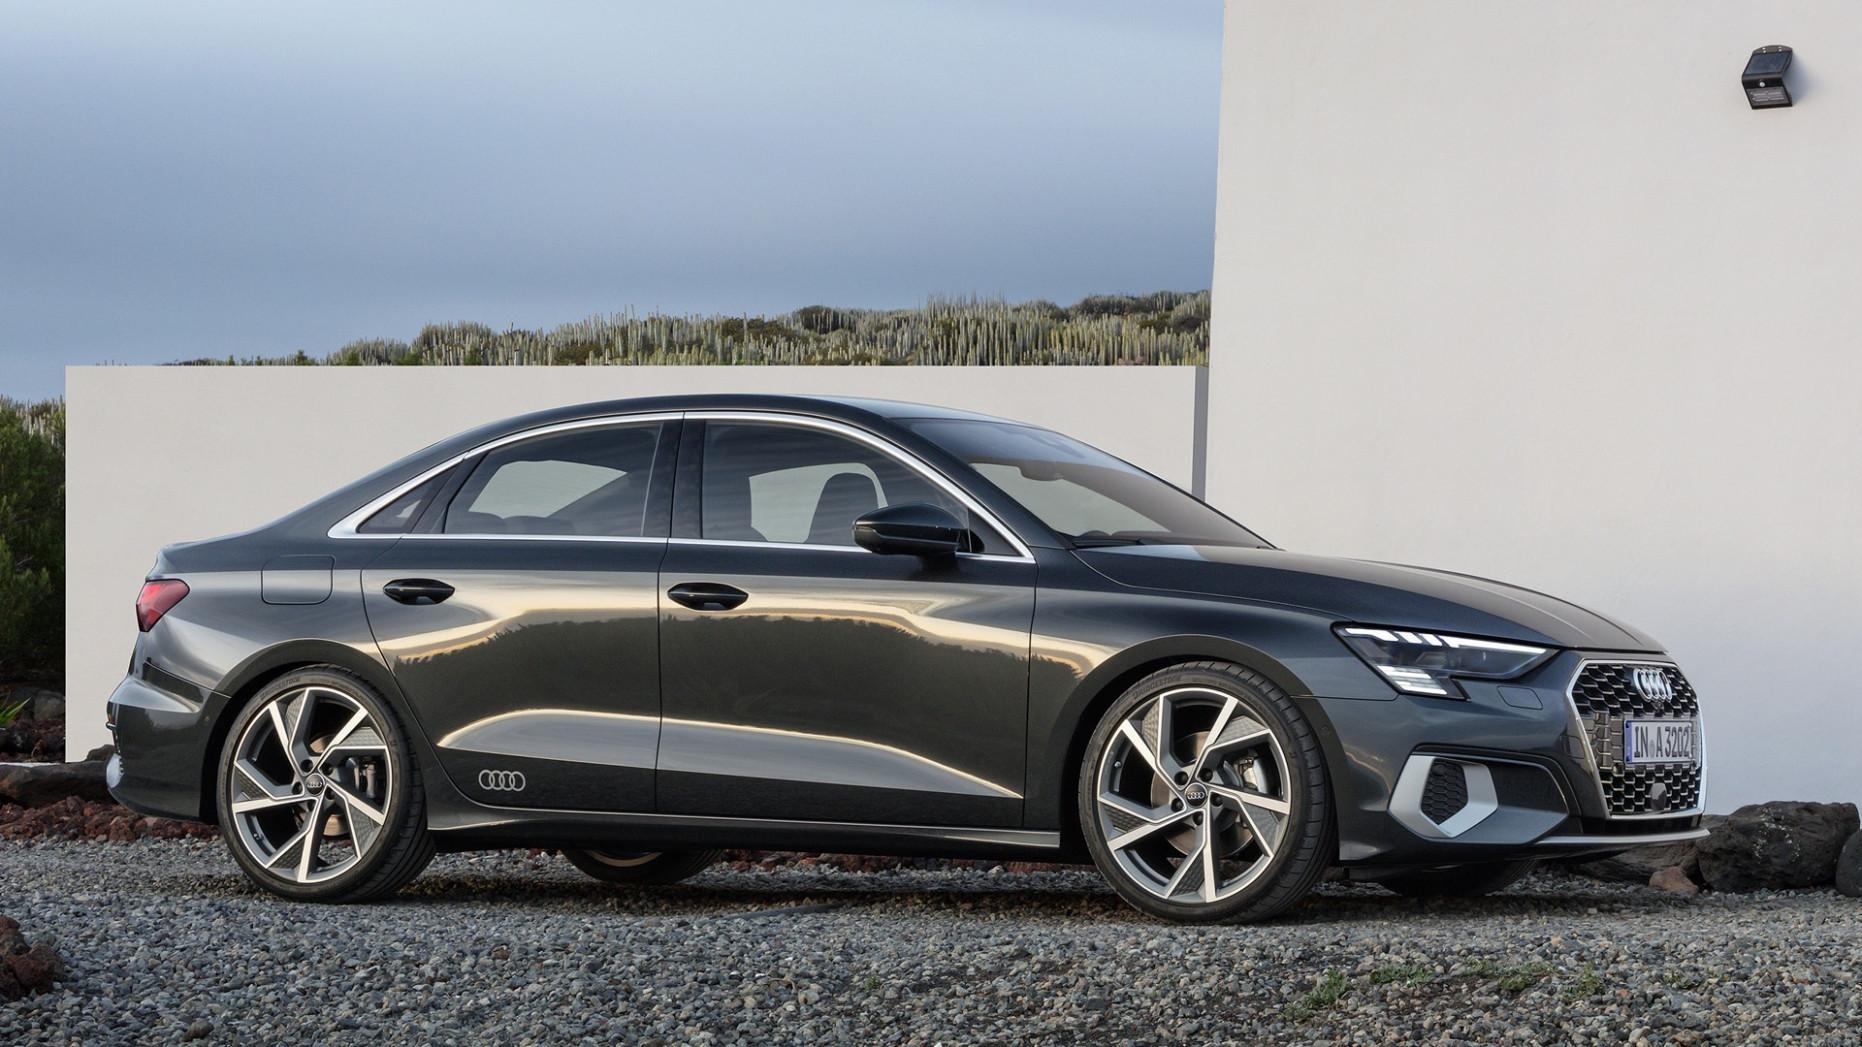 Exterior and Interior 2022 Audi A3